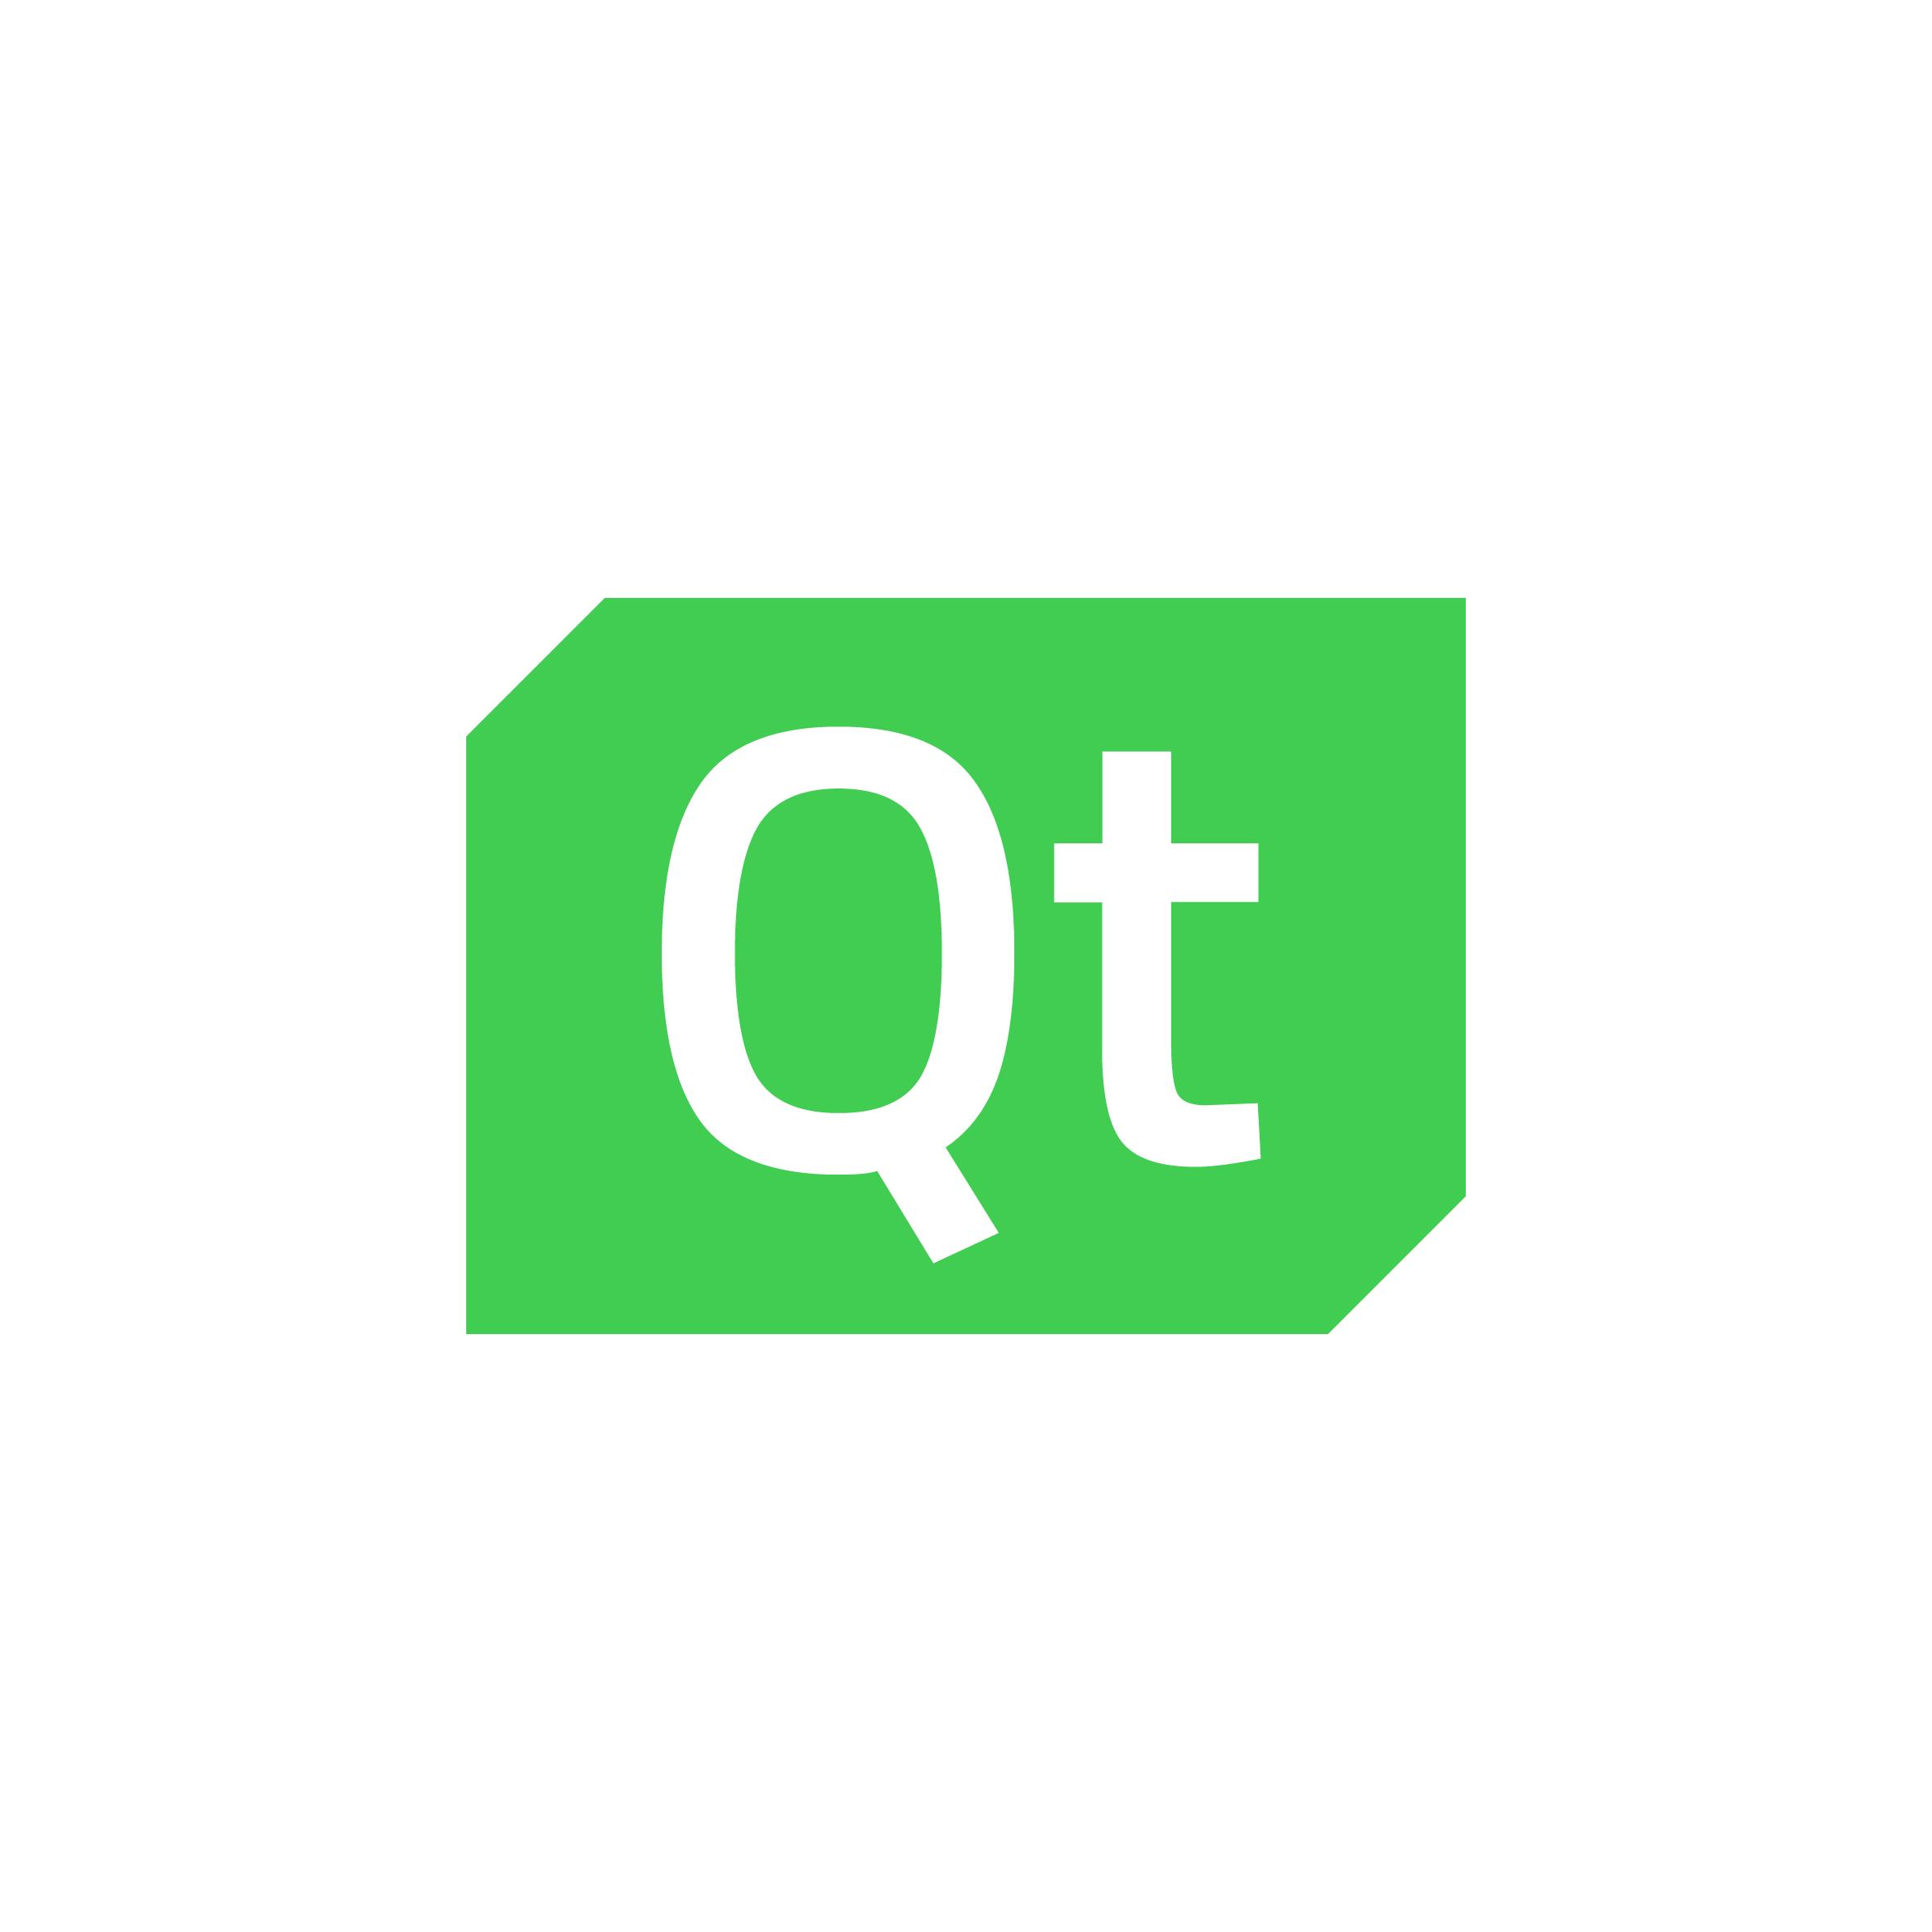 qt_logo_green_rgb_whitespace